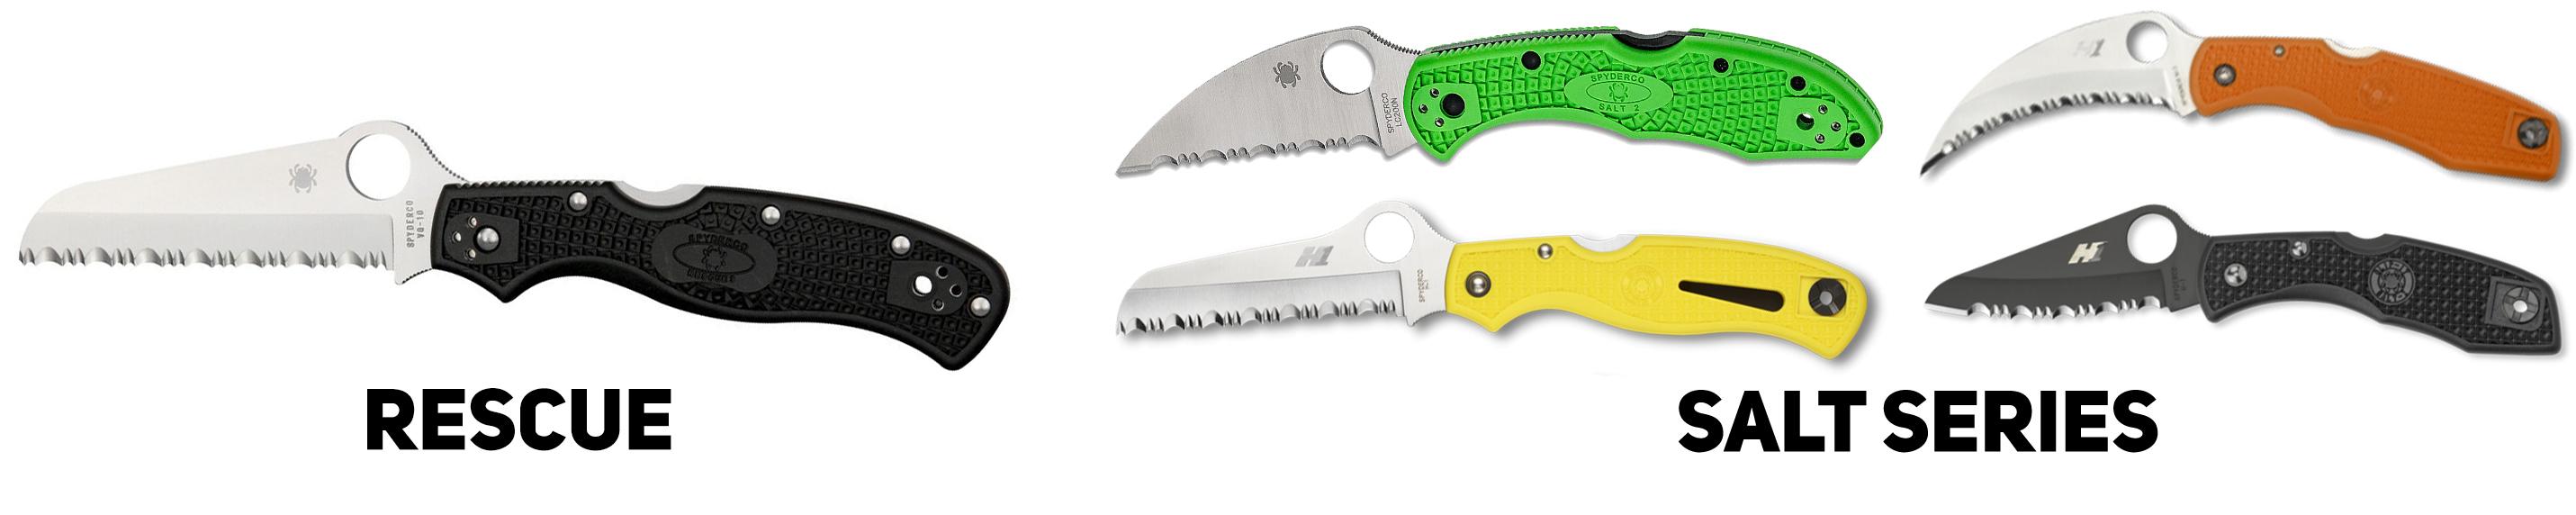 Ножи Spyderco с серрейтором